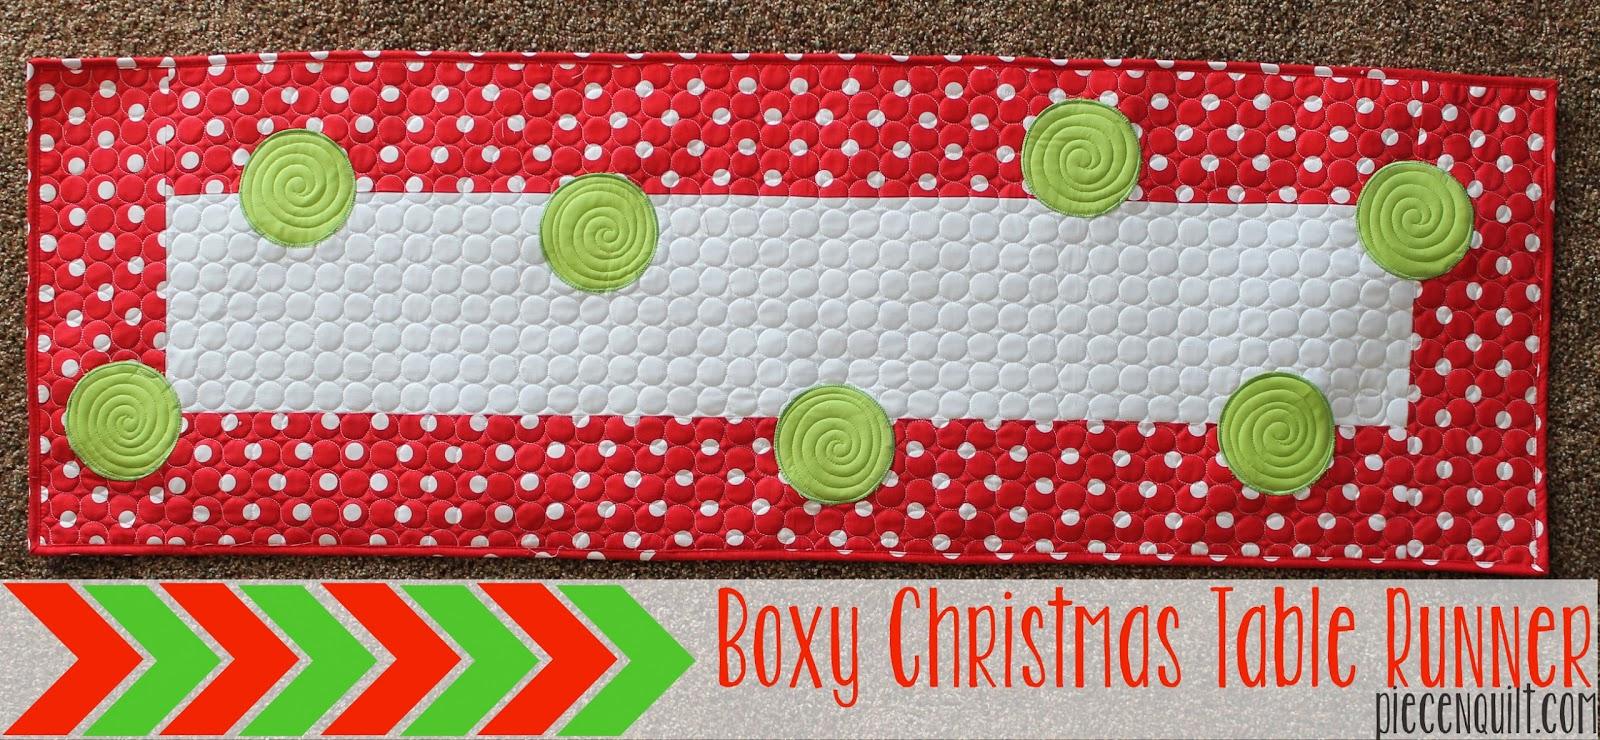 Boxy Christmas Table Runner